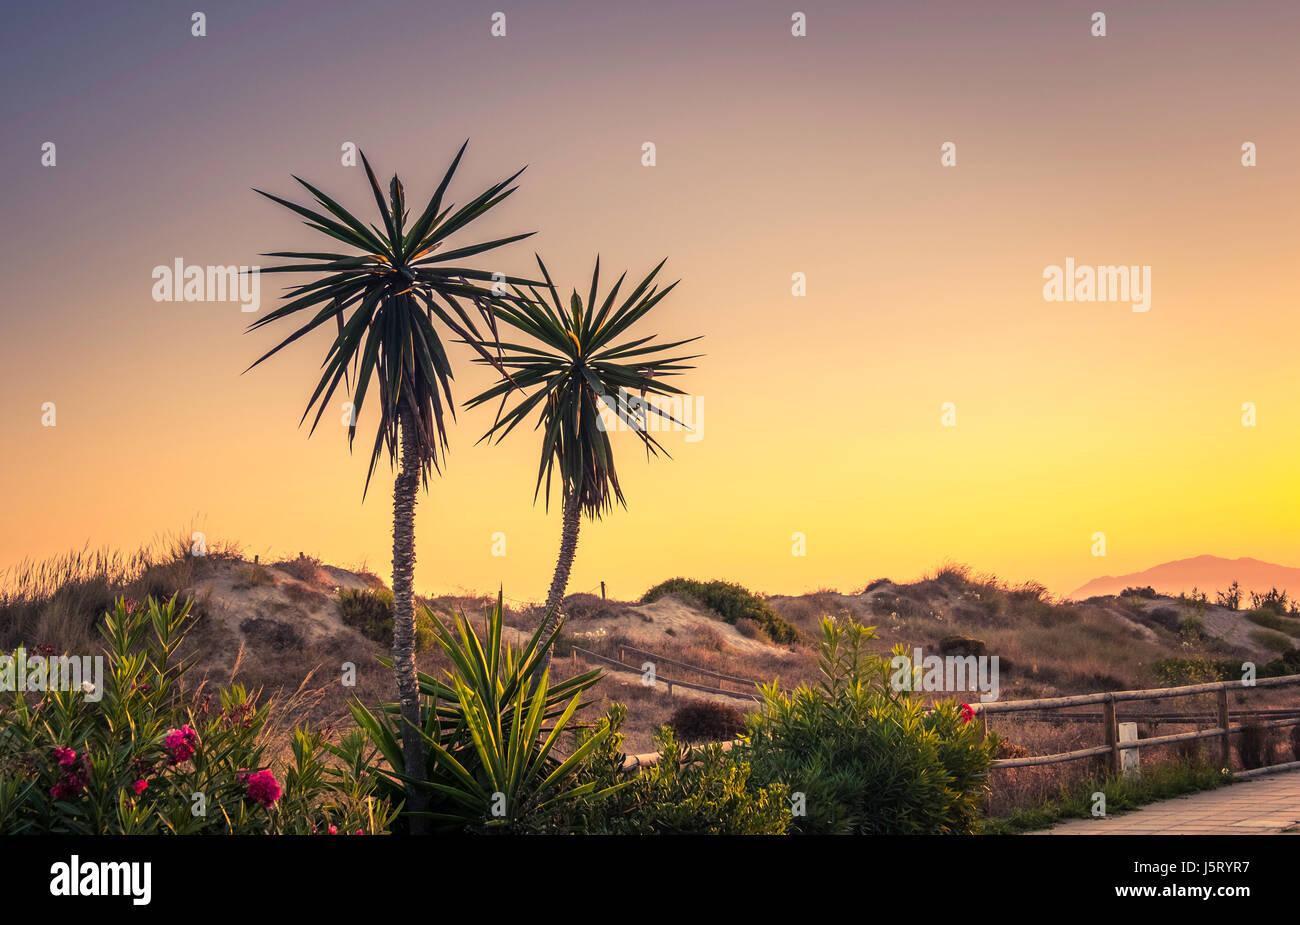 Early morning sunrise in Elviria, Marbella, Spain. - Stock Image